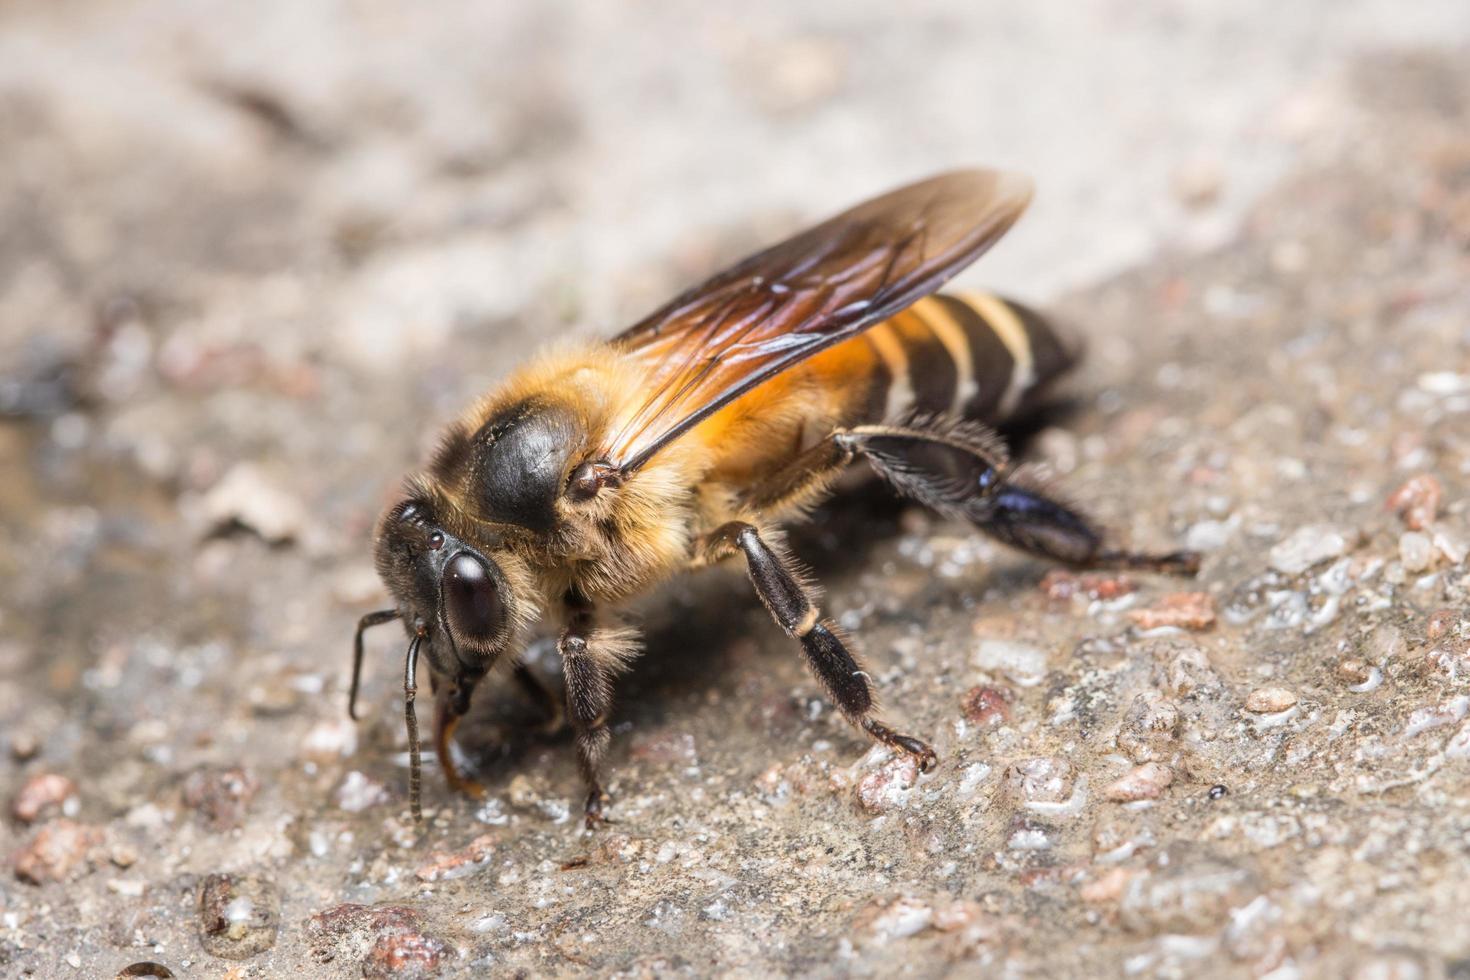 abeille royale photo en gros